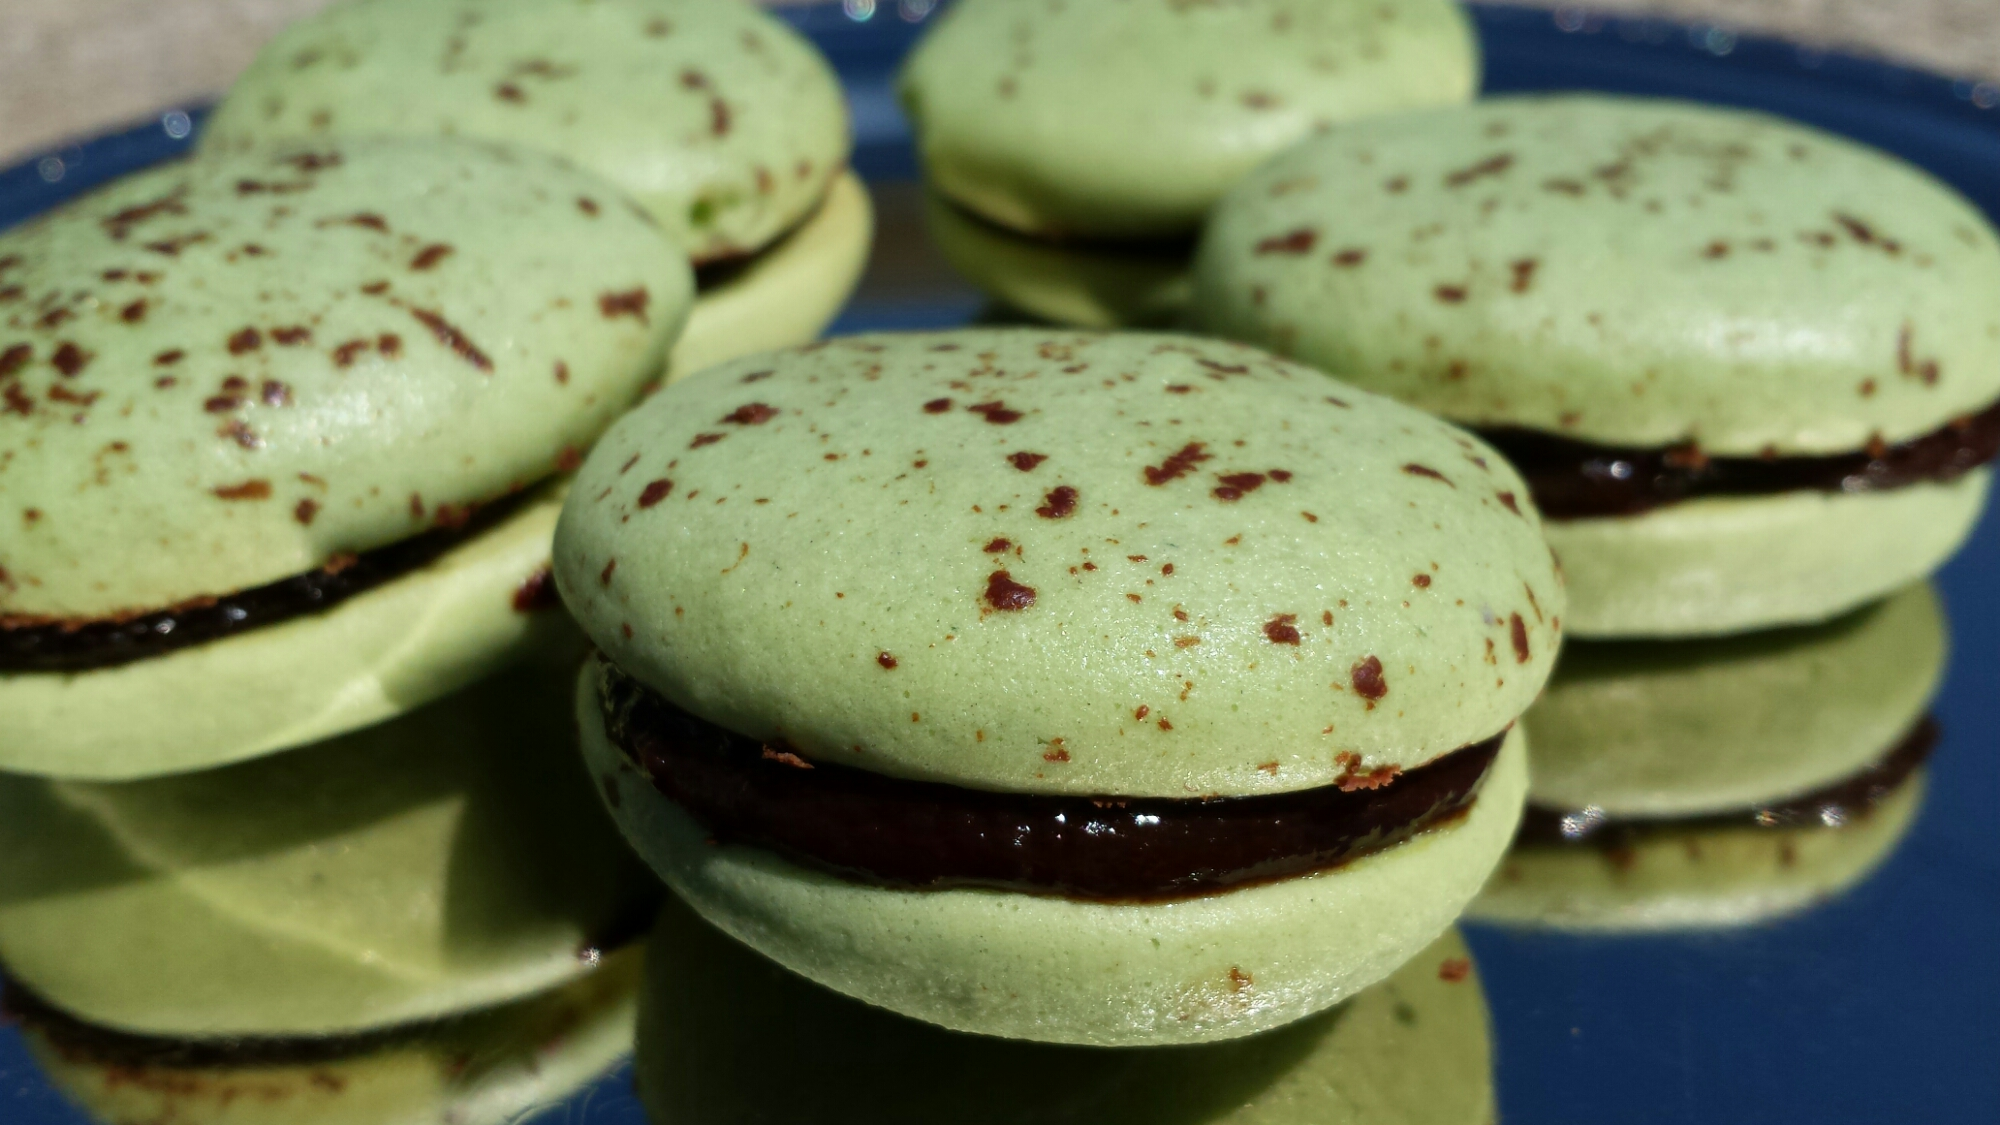 Vegan Macaron Troubleshooting